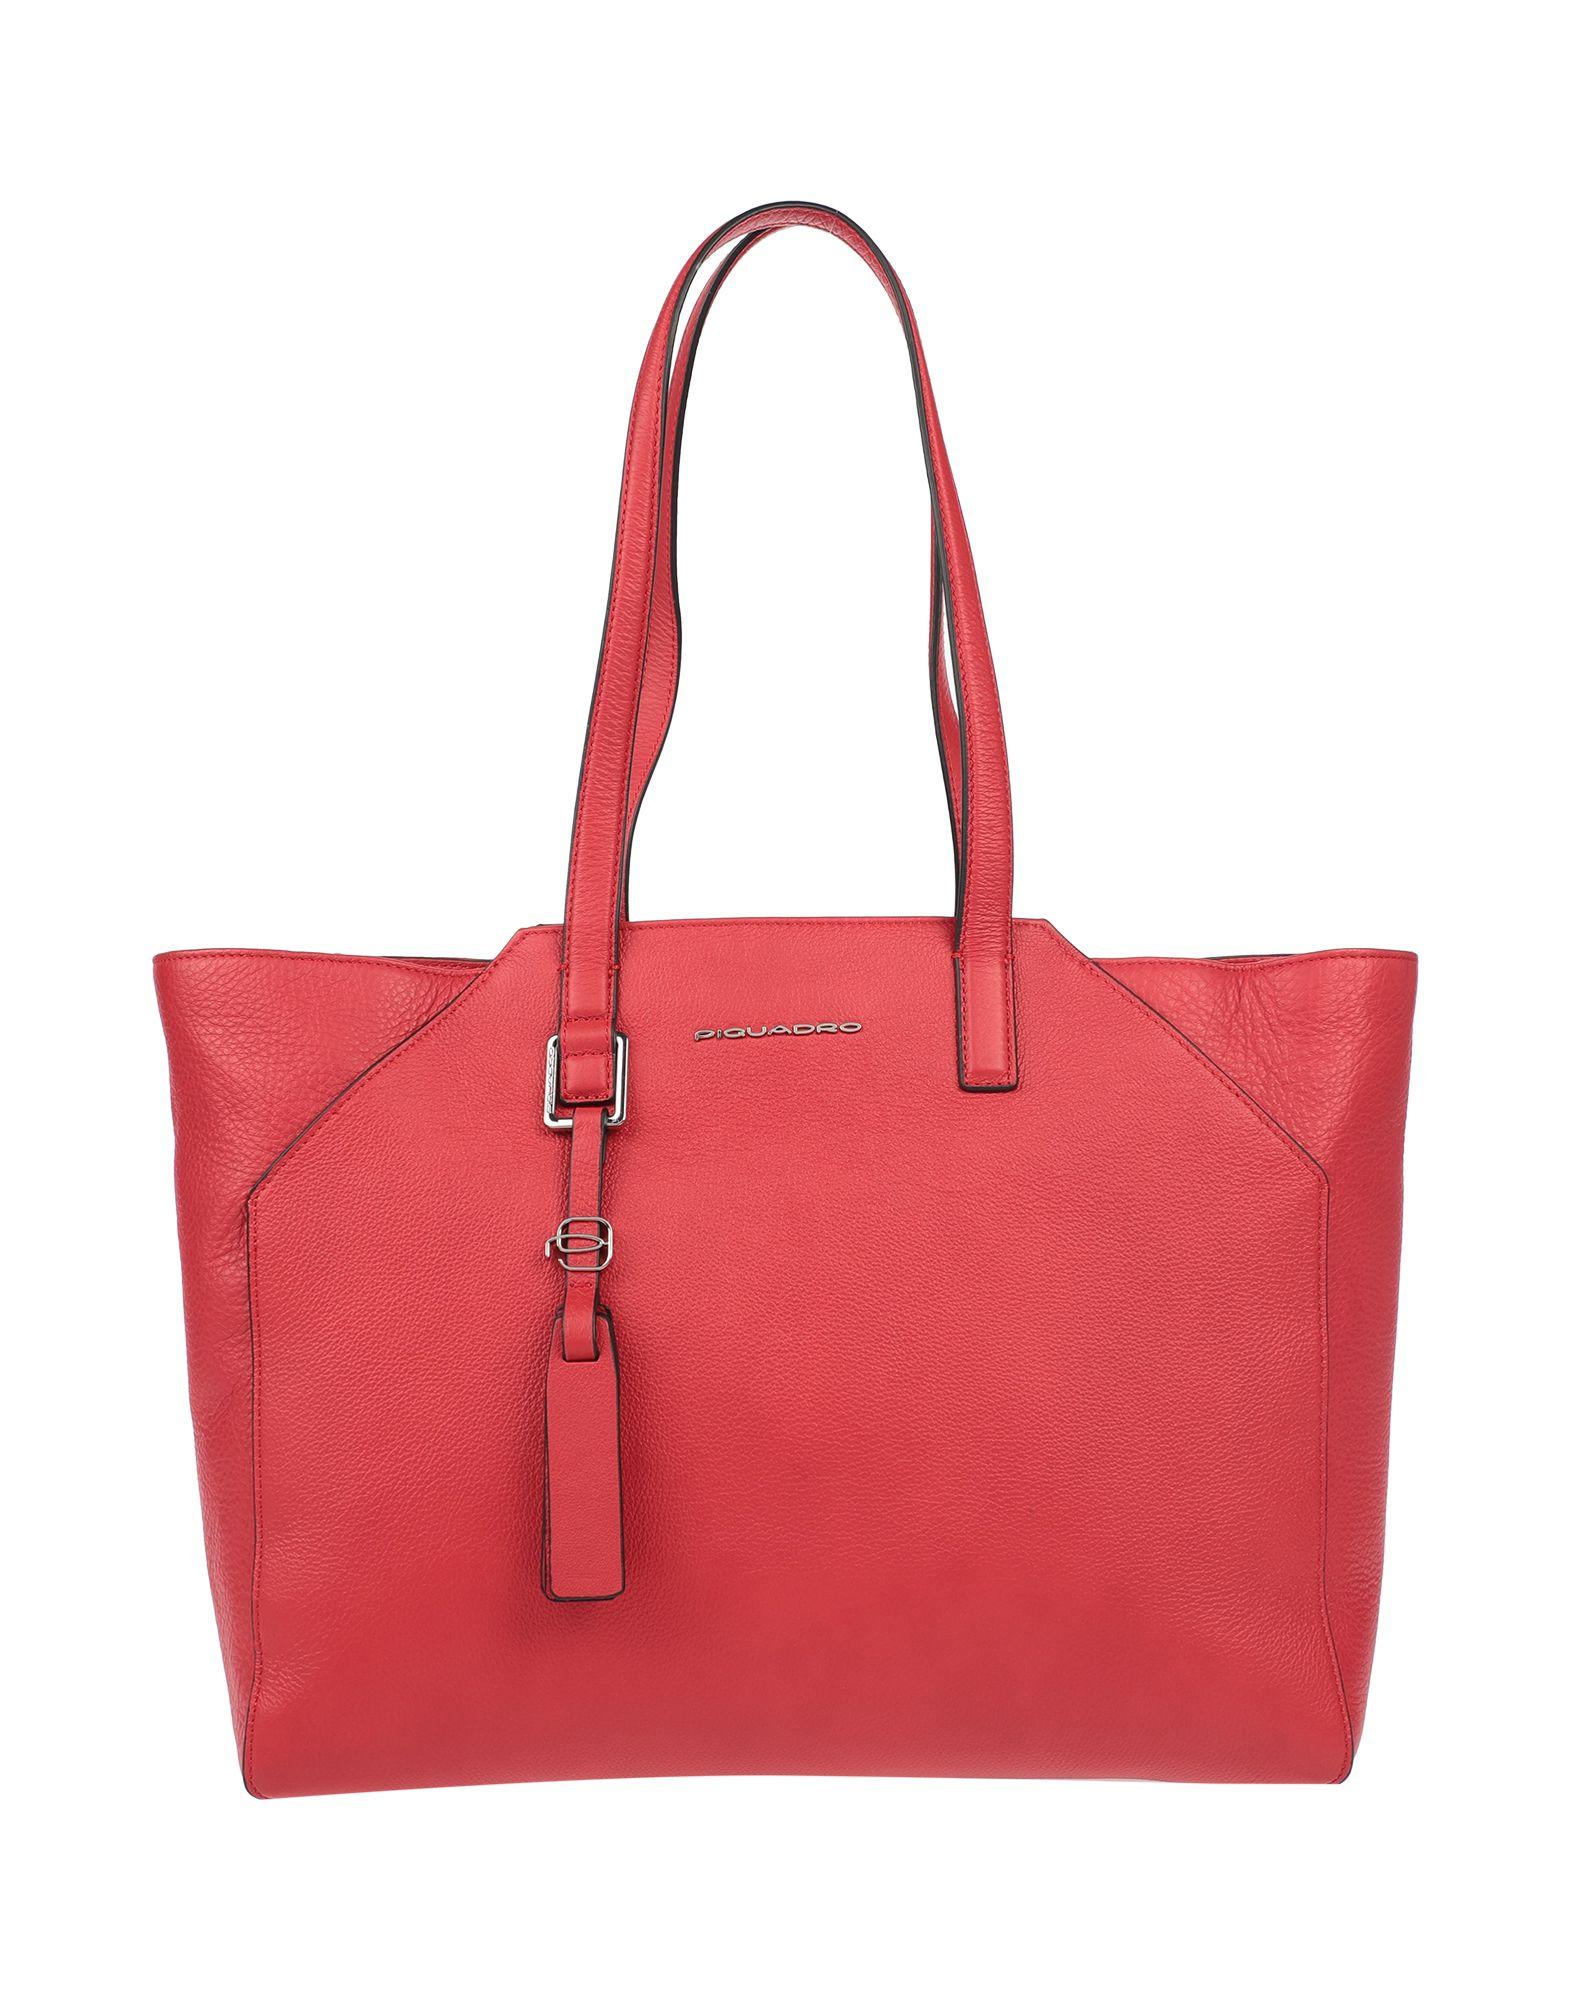 PIQUADRO Shoulder bags - Item 45519632